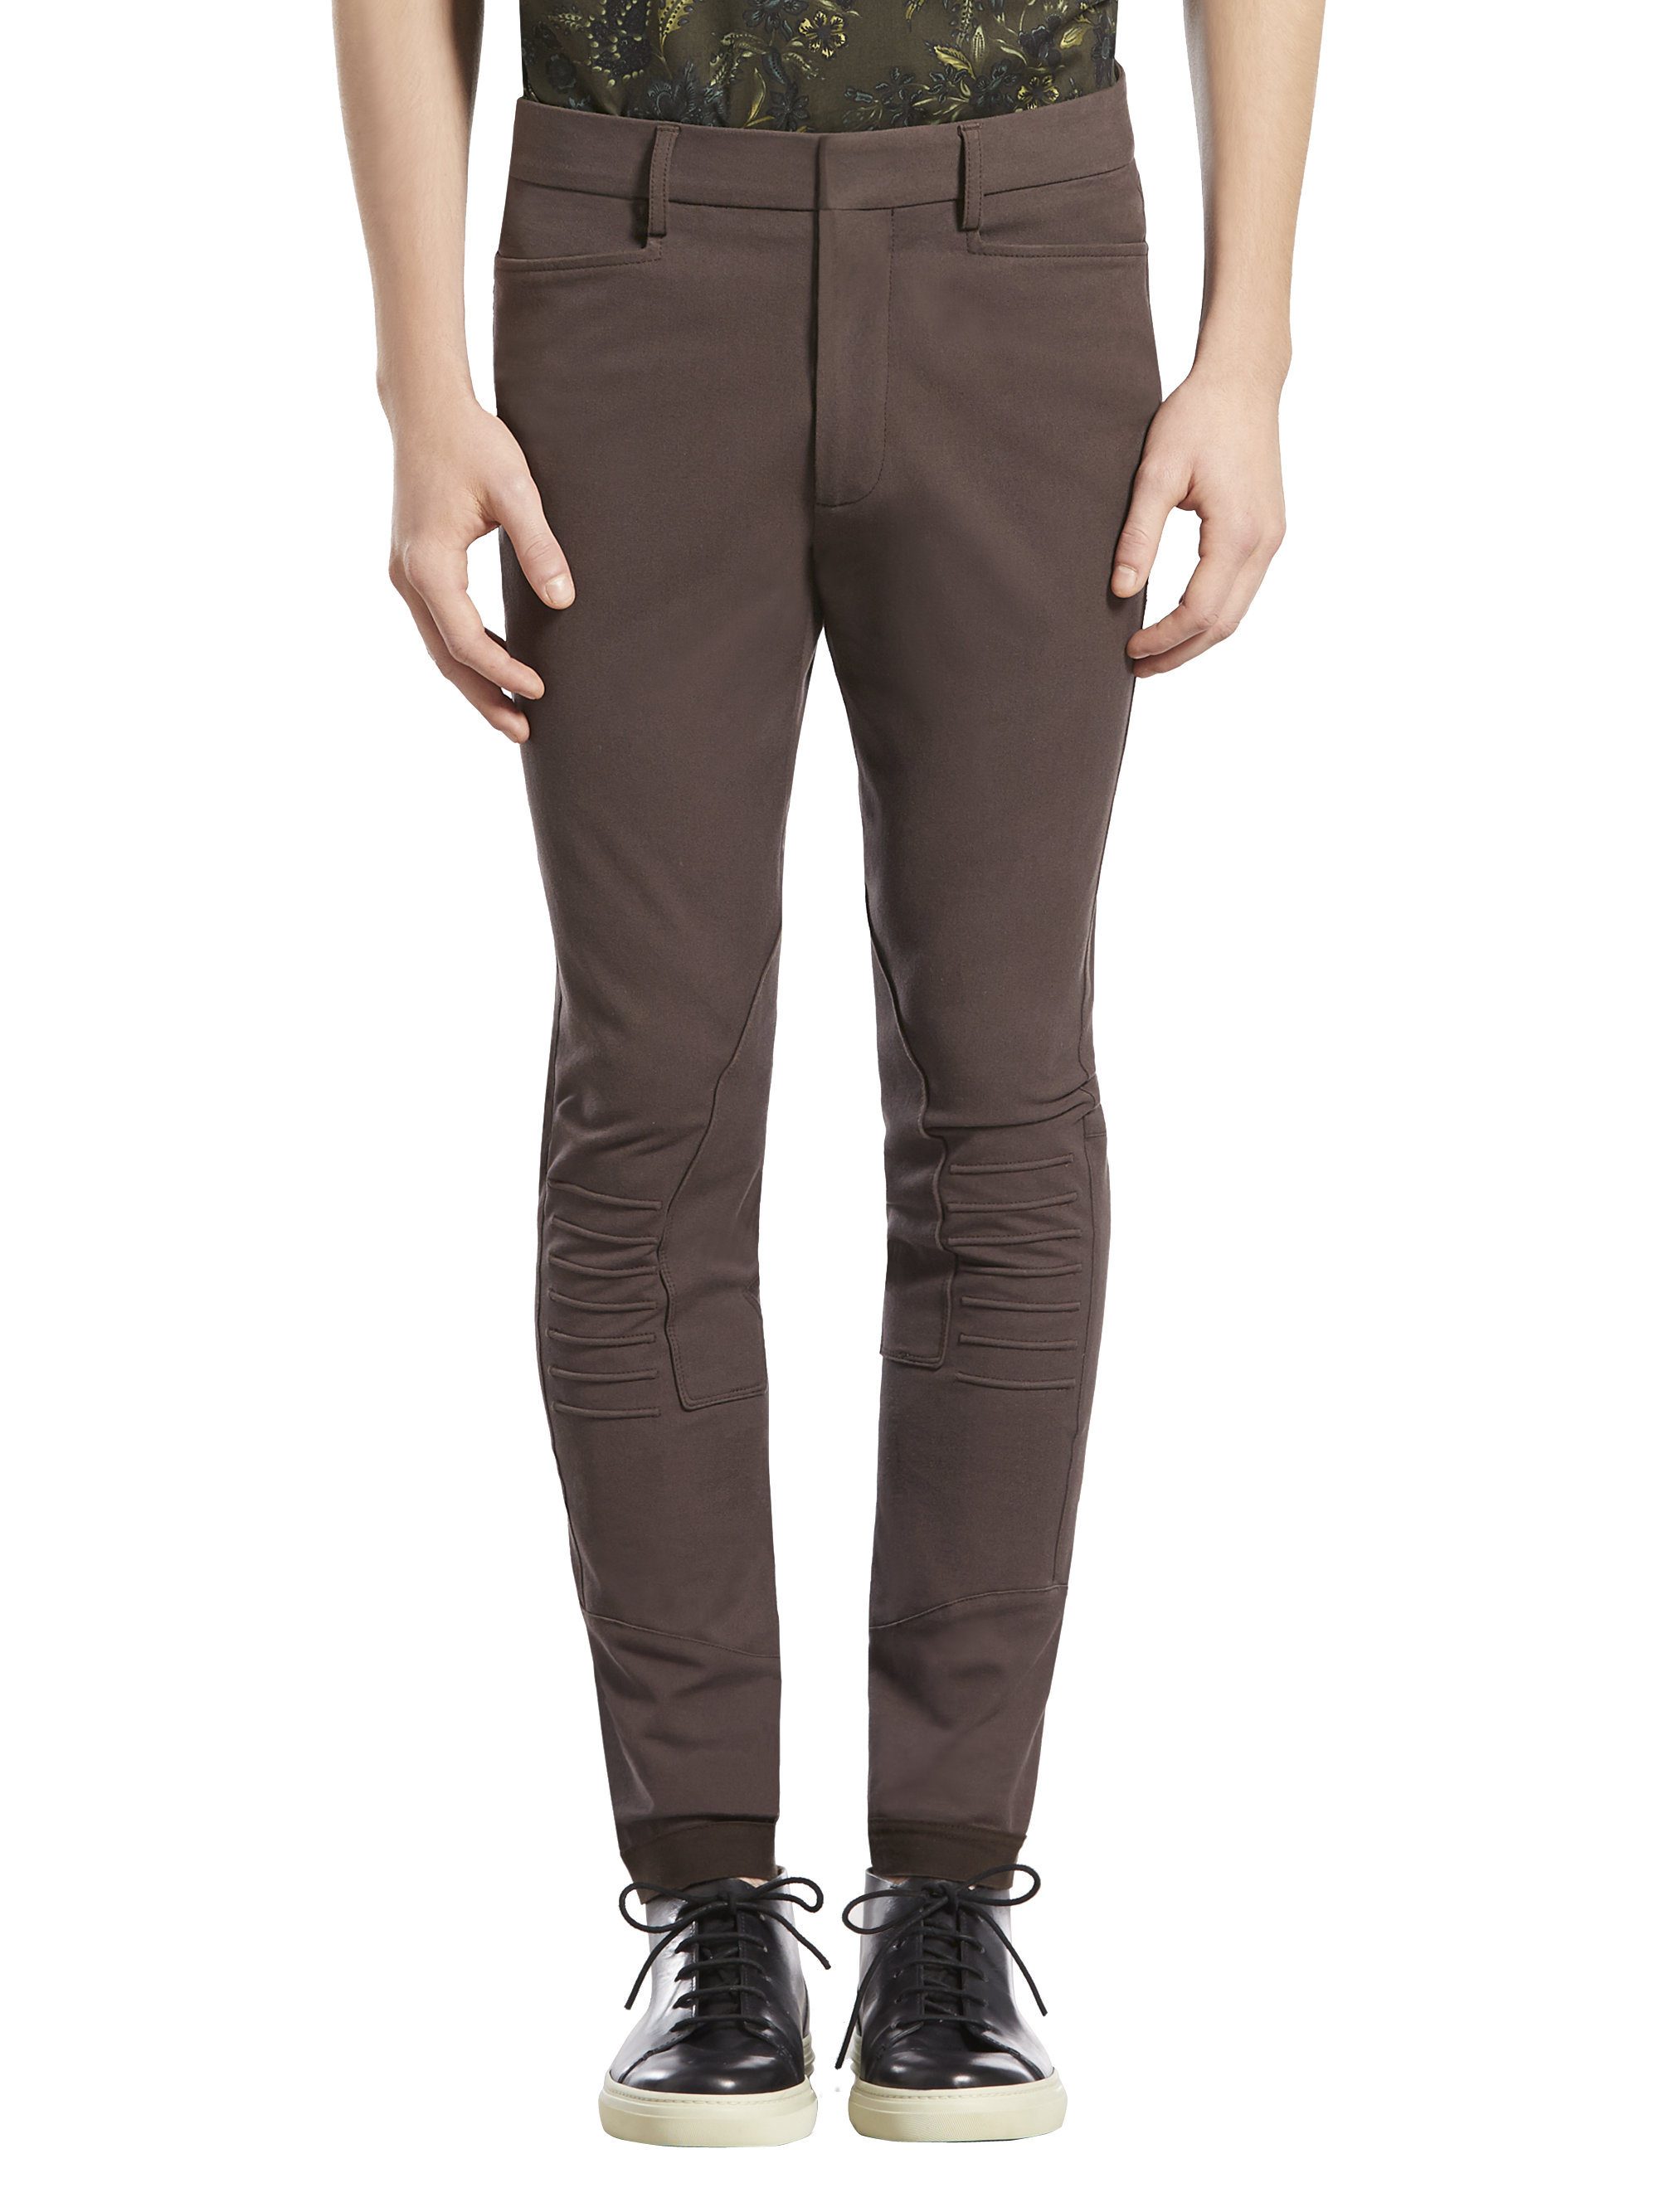 Zara Jeans For Mens